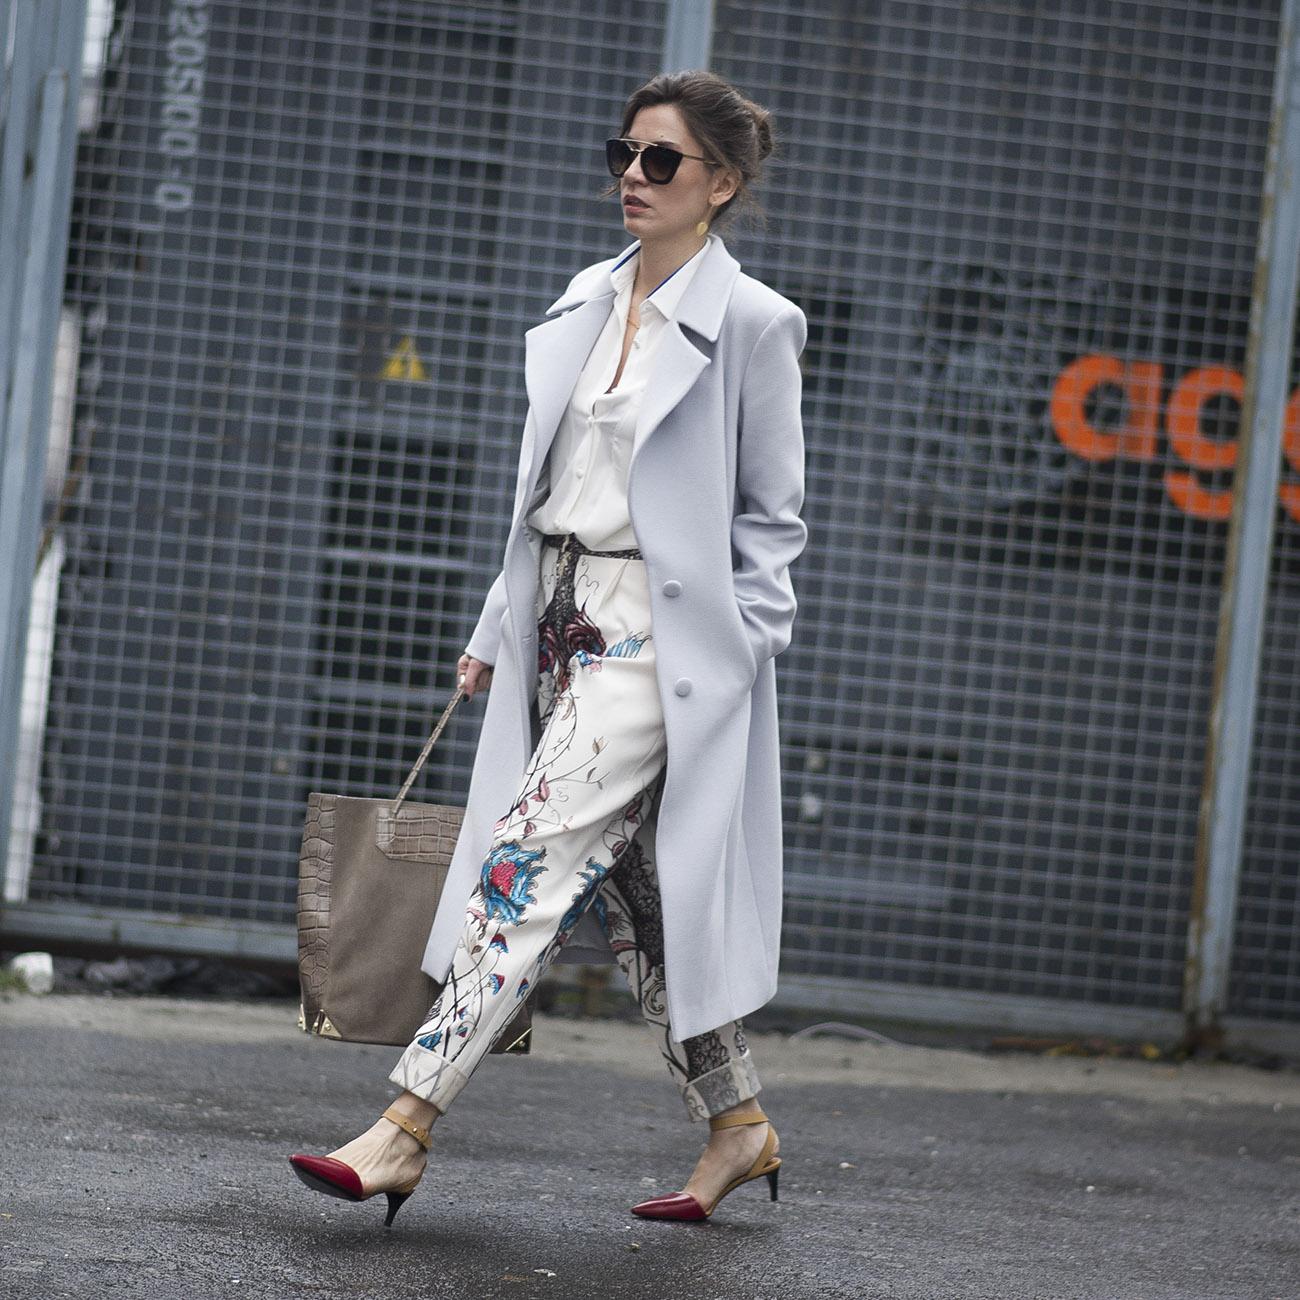 alexander wang, see by chloe, off ne giysem, billur saatci, zeynep tosun, zeynep ökmen, zeynep ökmen atölye, prada, prada sunglasses, ekria, jewellery,  nihan peker, mercedes-benz istanbul fashion week, mbfwi, mbfwidiary, street style,